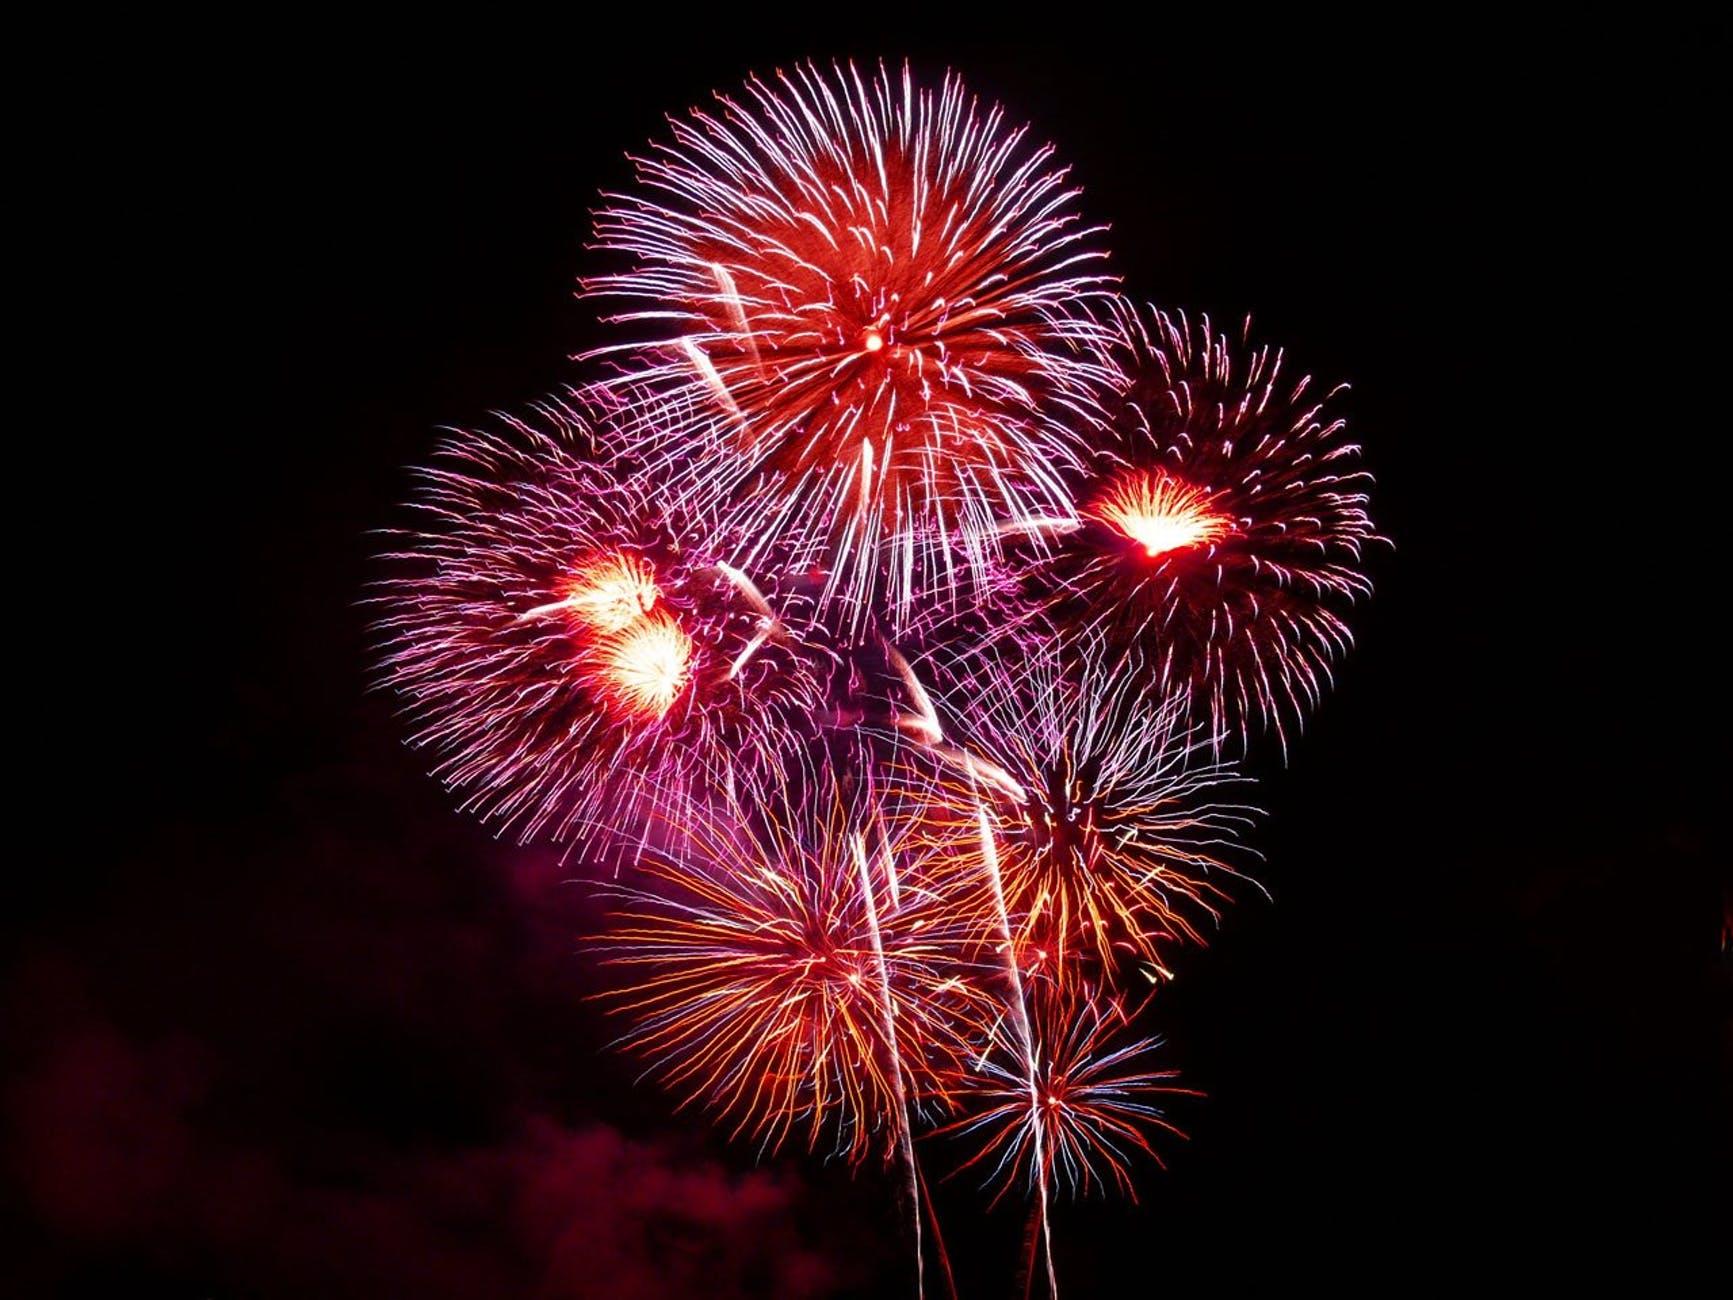 fireworks-rockets-colors-explosion-50556.jpeg